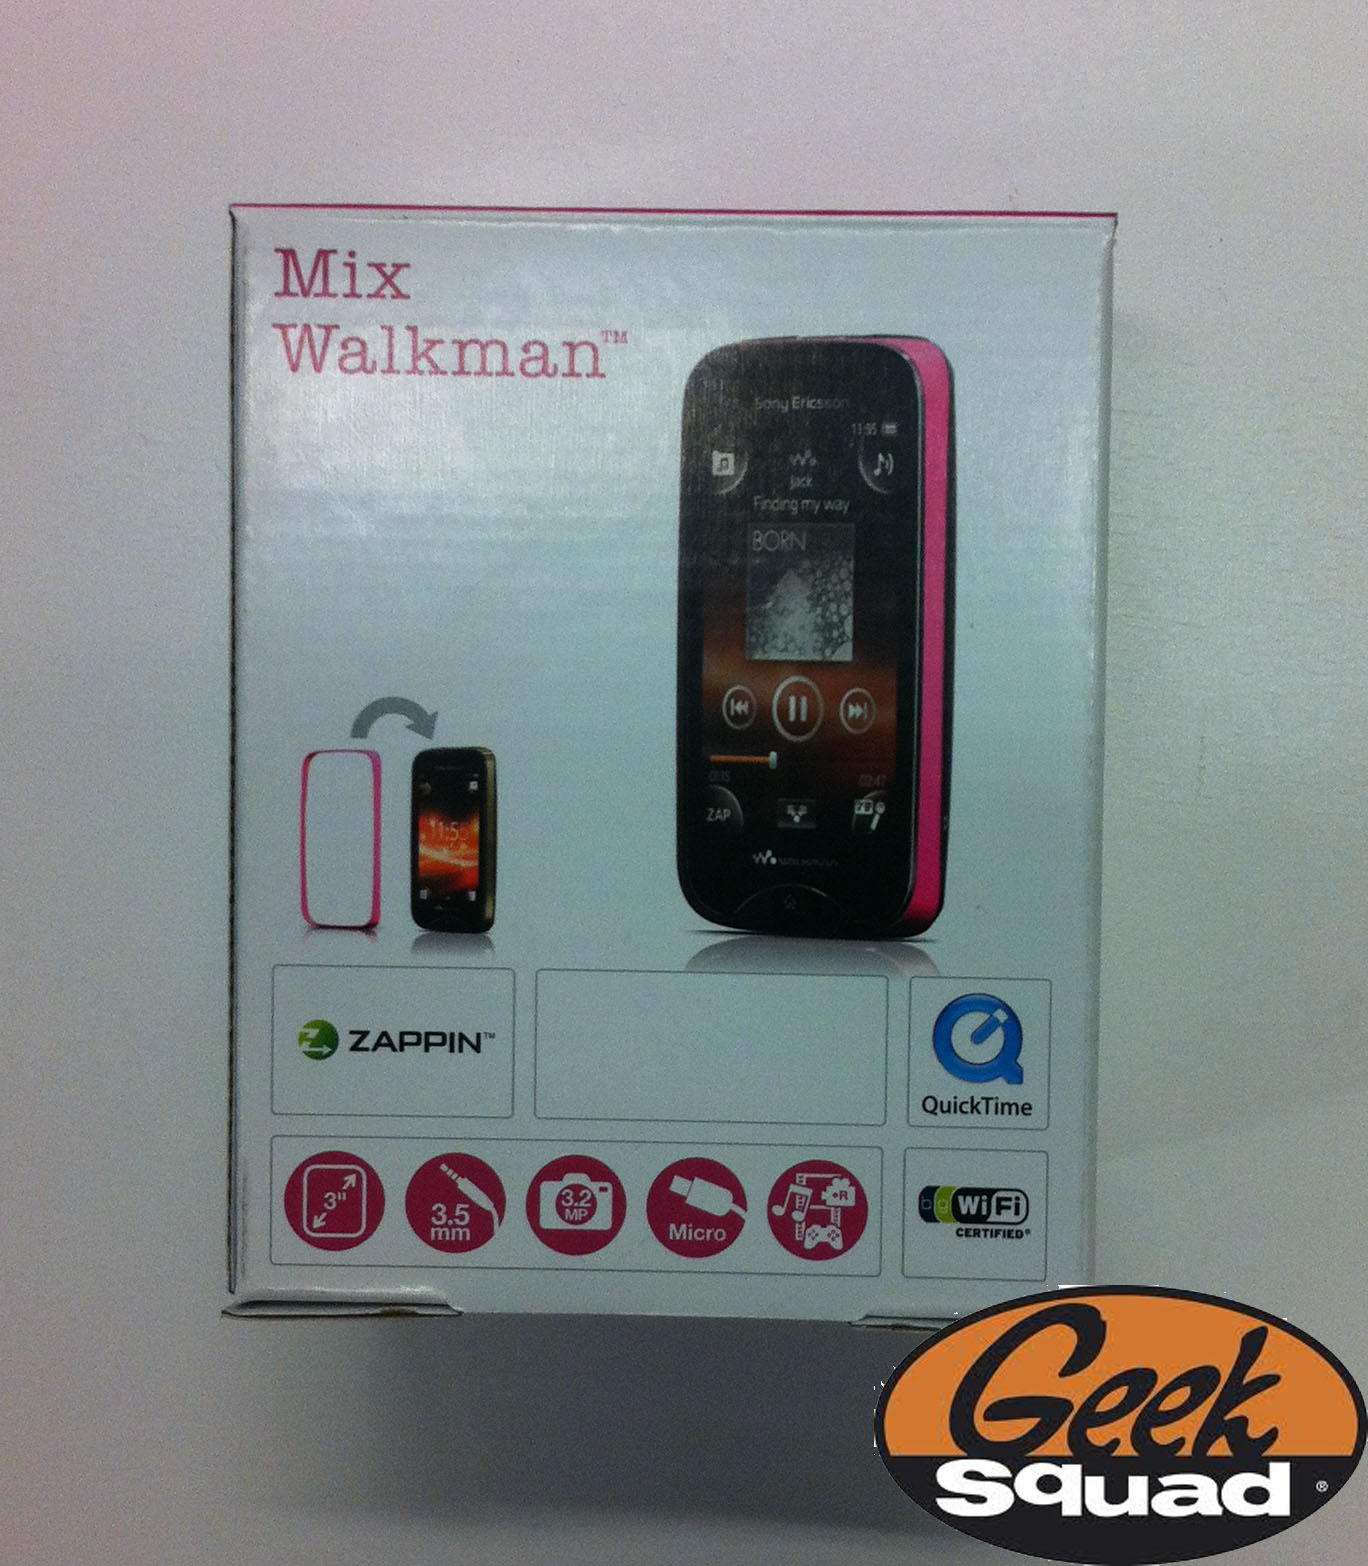 Análisis. Desempaquetamos el Sony Ericsson Mix Walkman